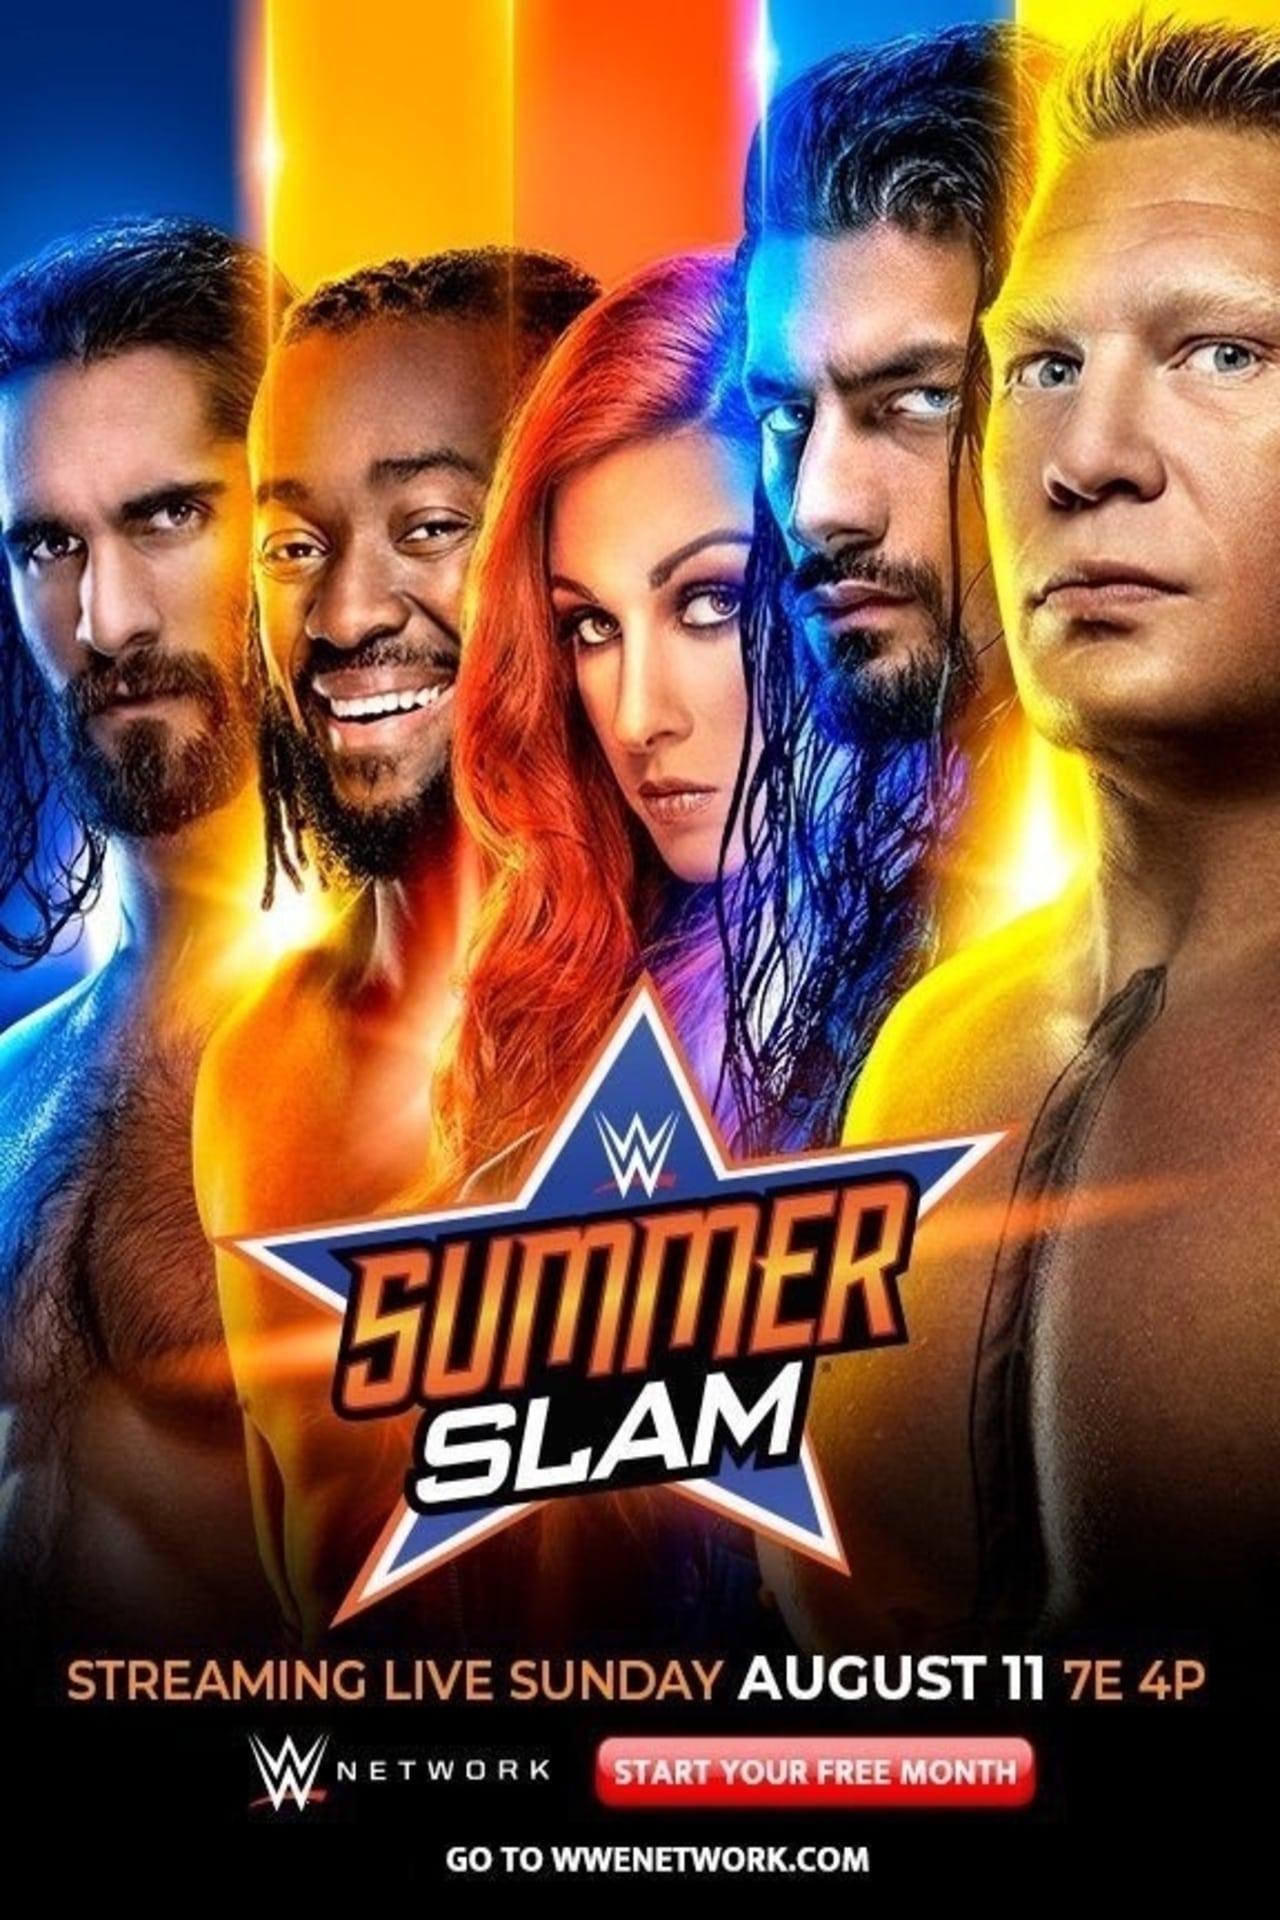 WWE SummerSlam 2019 (2019)